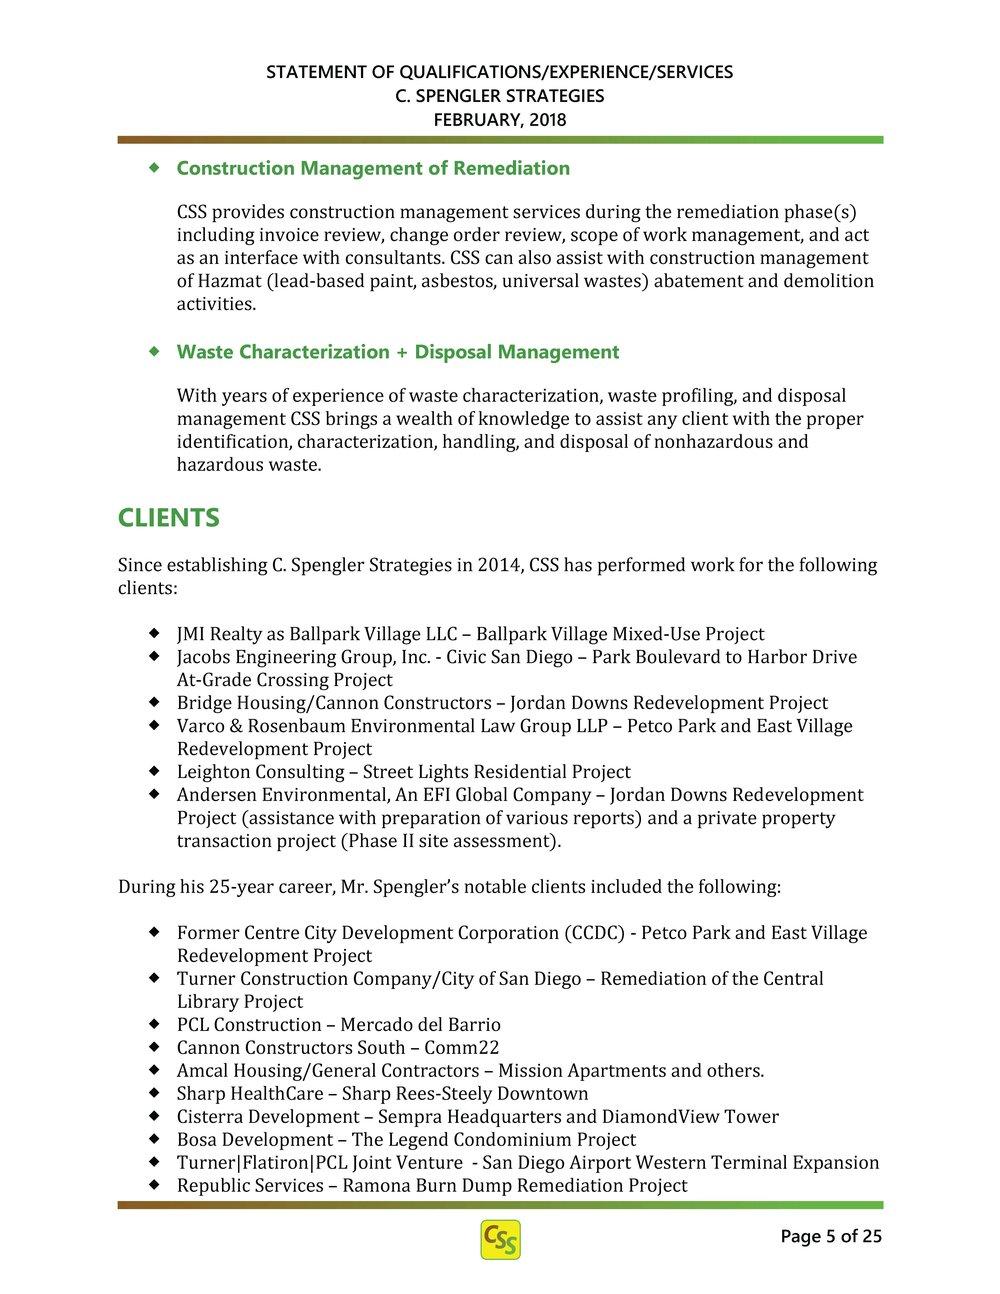 C.Spengler Strategies SOQ.2.13.18_Page_06.jpg